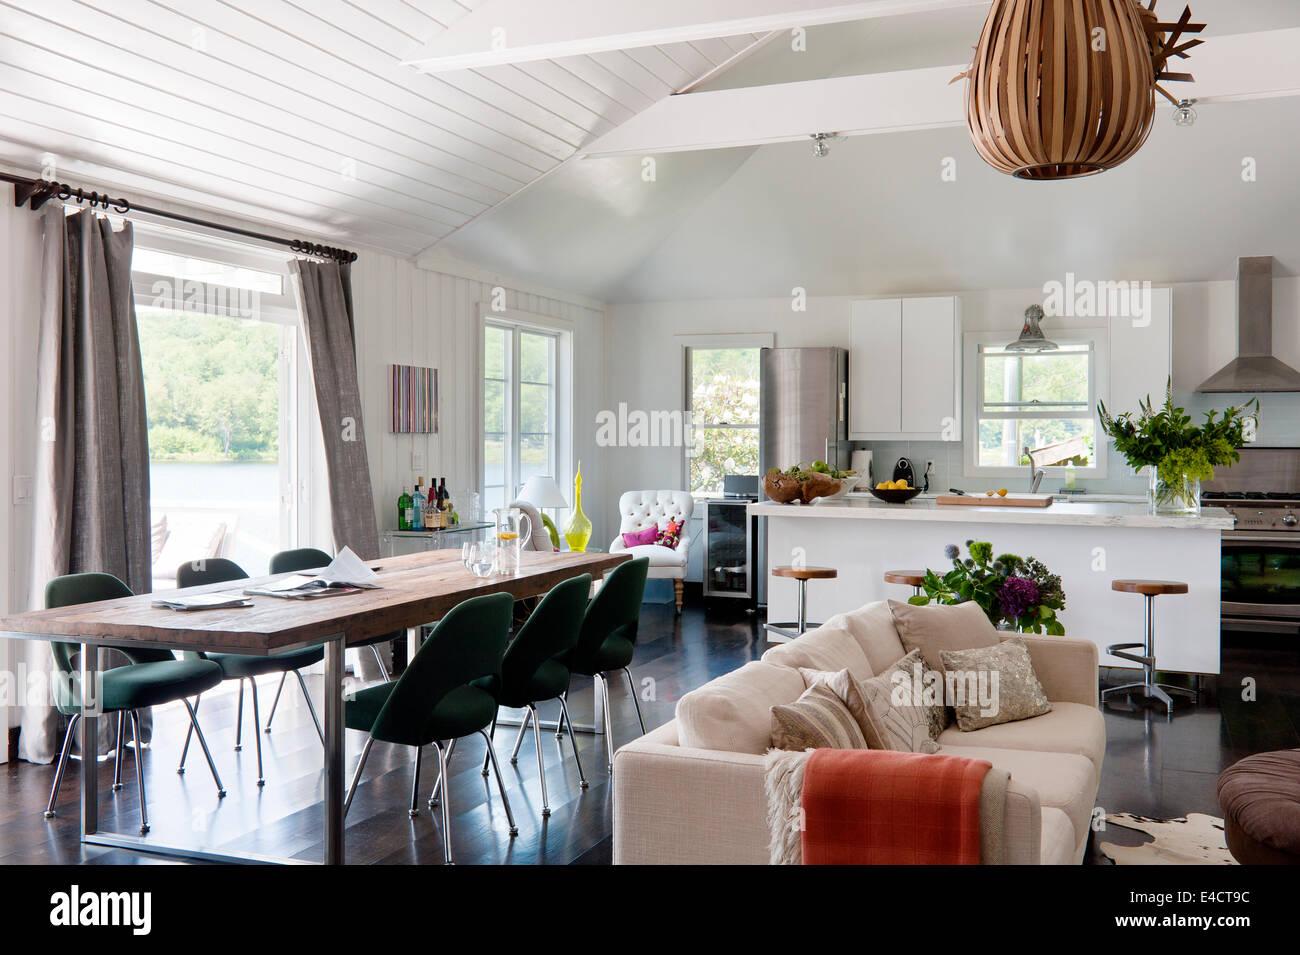 Cuisine Ikea Ouverte Sur Salon plan ouvert salon blanc avec espace cuisine ikea, knoll